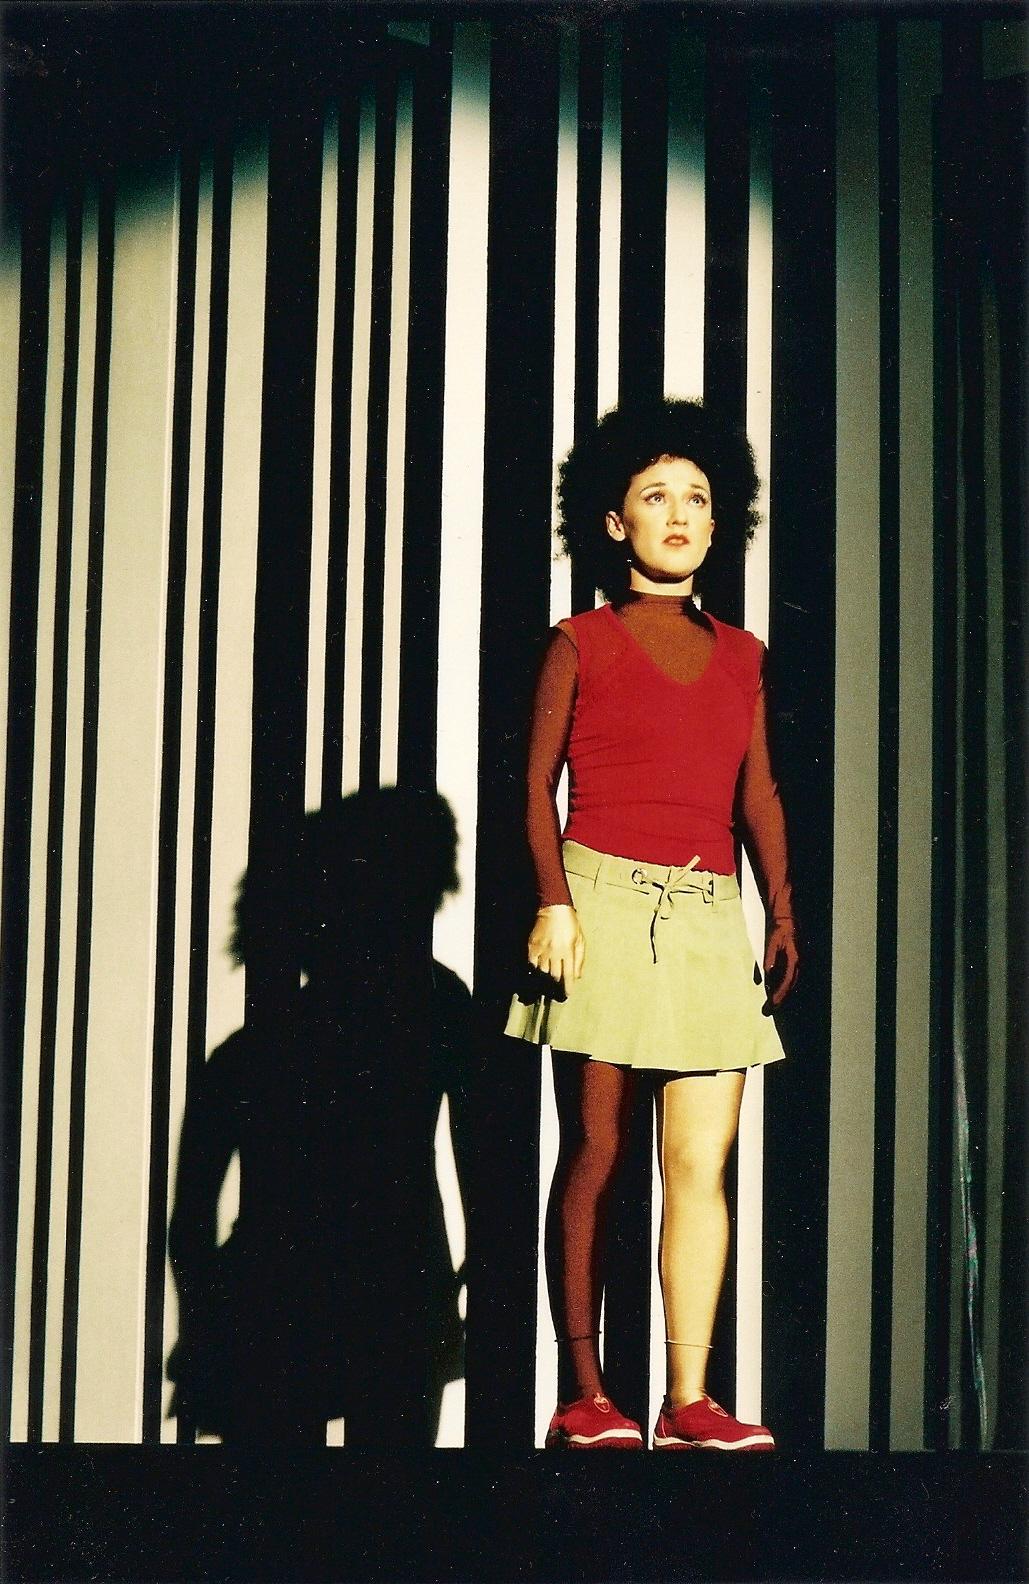 Hysterikon, 2003; Theater Heilbronn, Fotos: Emanuela Danielewicz